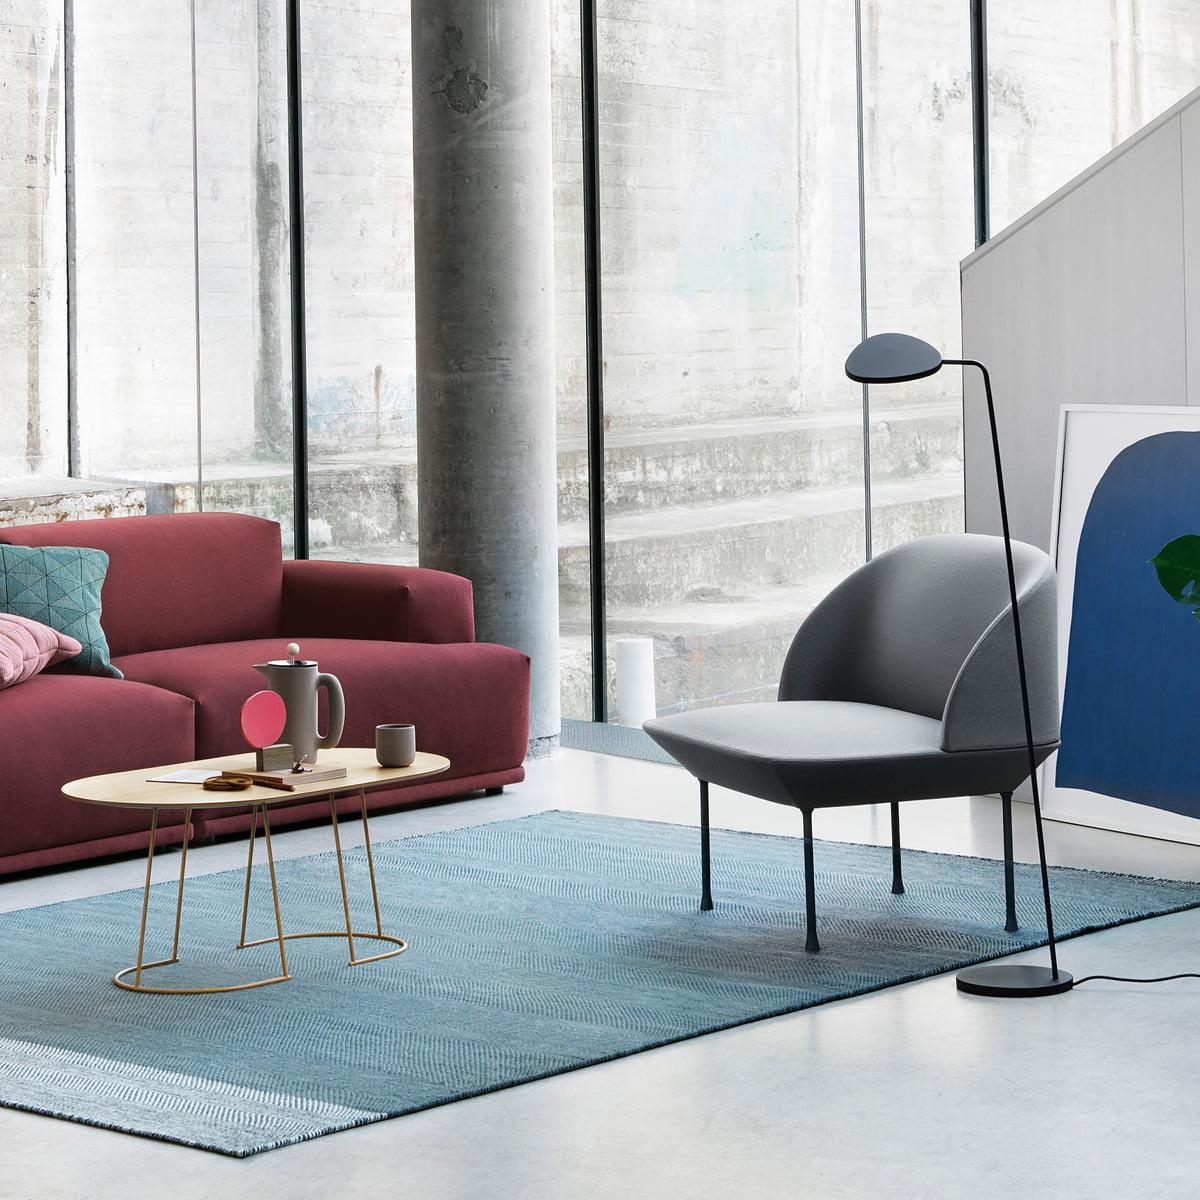 Muuto Leuchte oslo lounge chair muuto connox shop